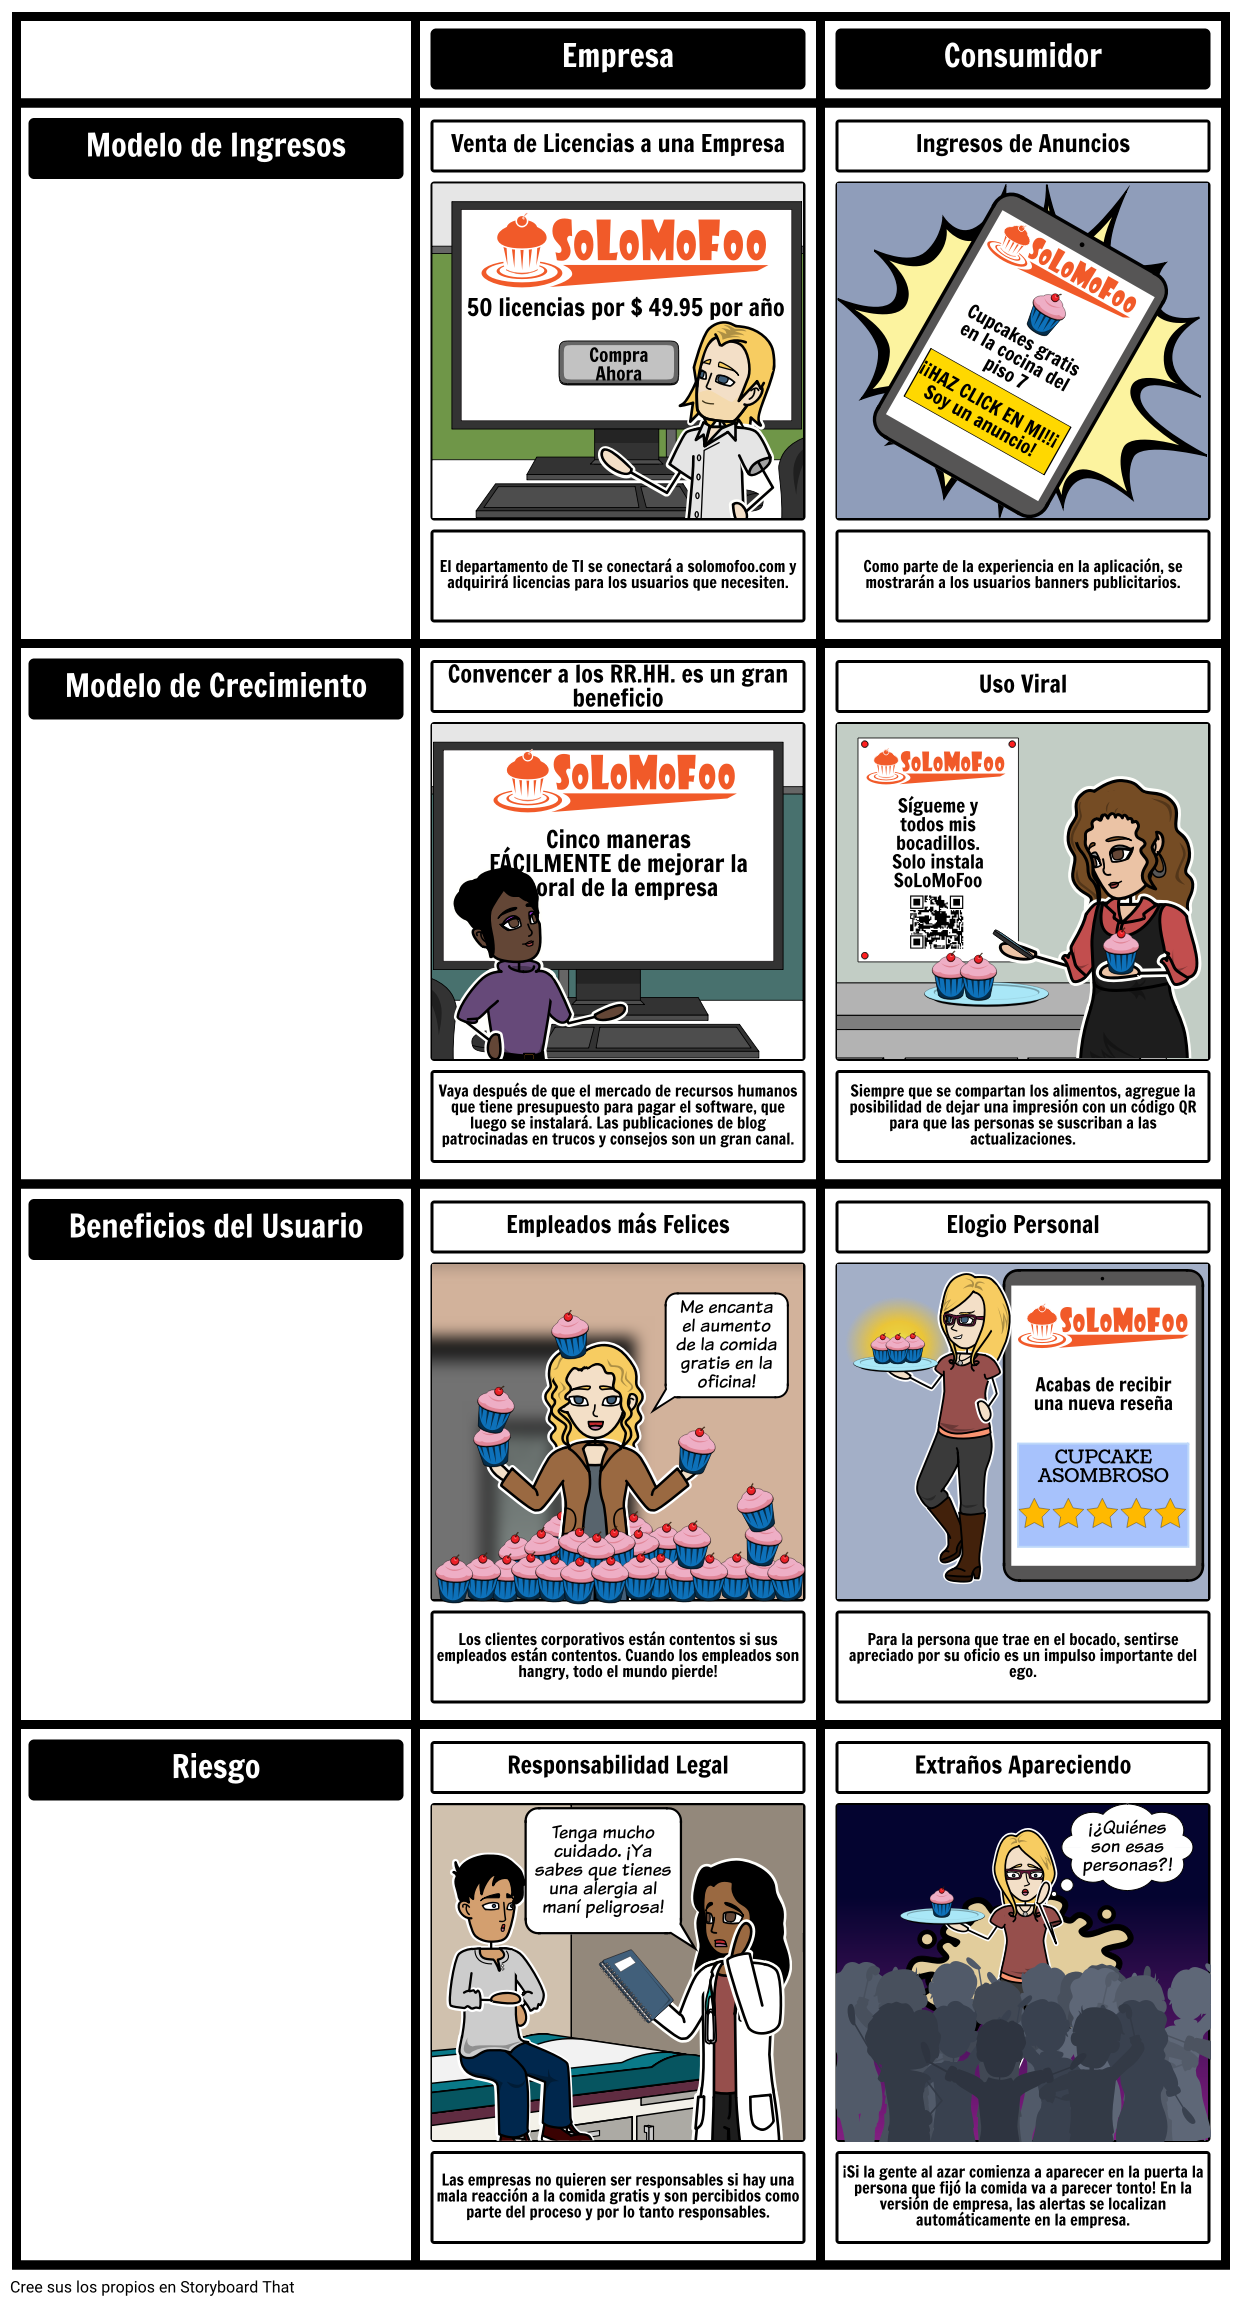 SoLoMoFoo Comparación de Modelos de Negocios